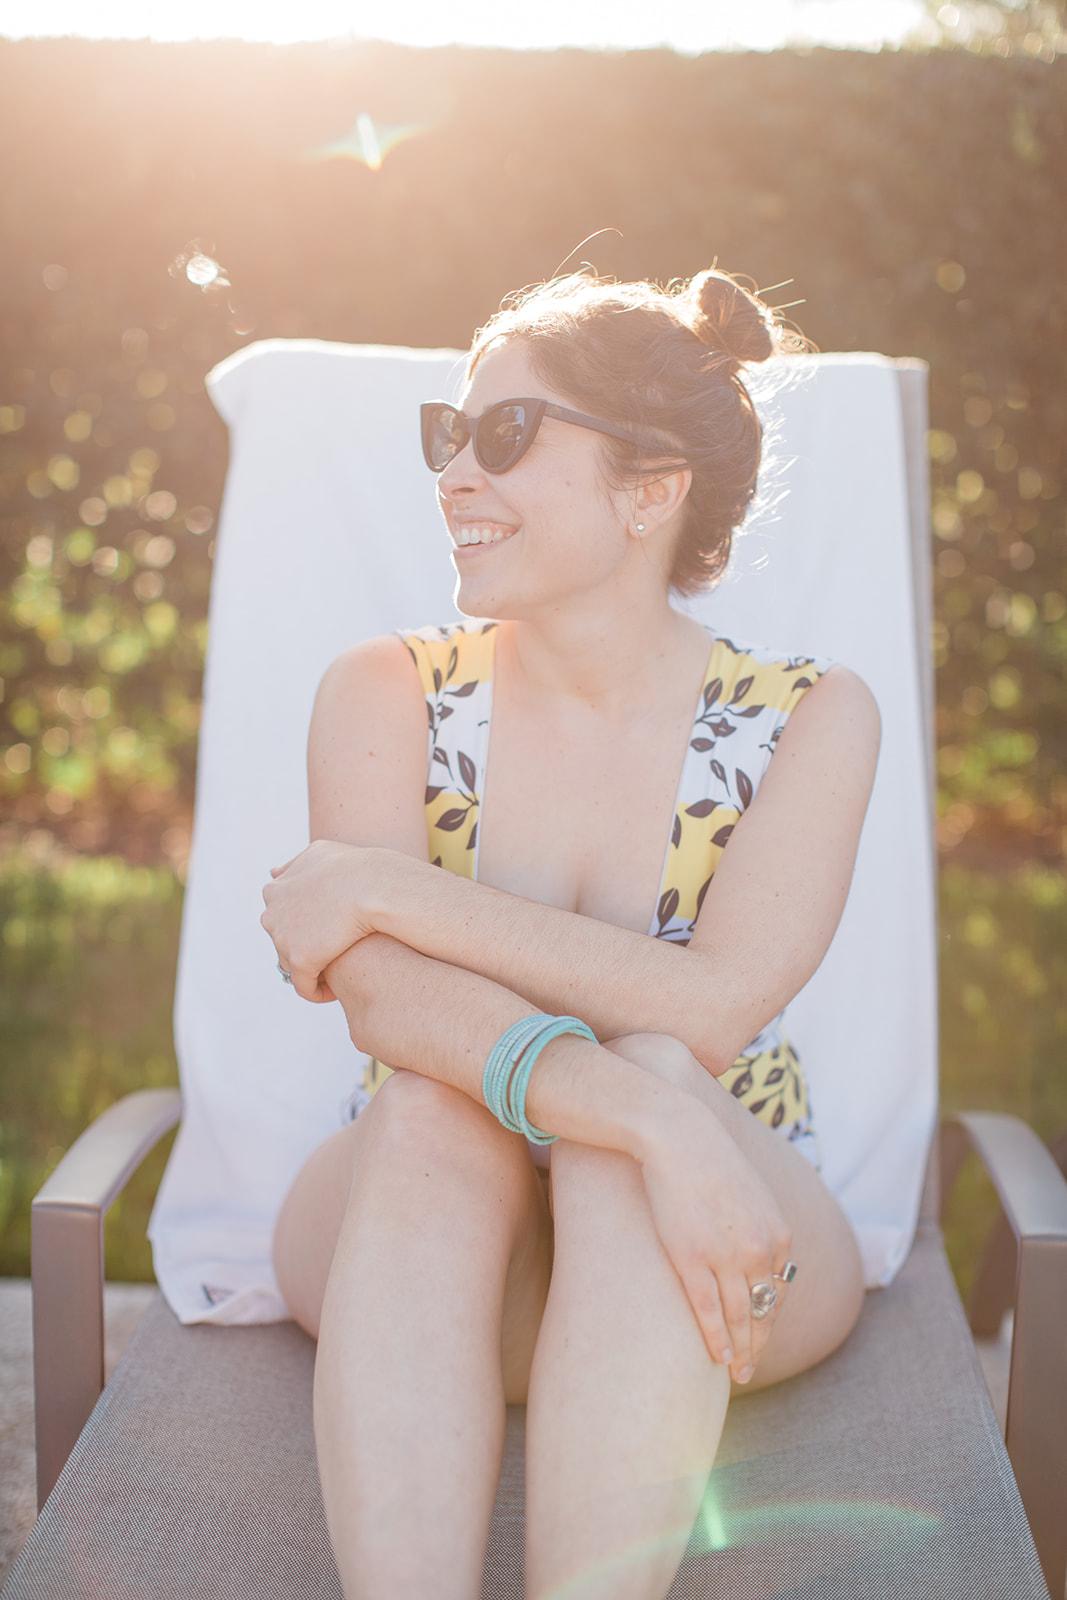 emsontheroad-root-sunglasses.jpg